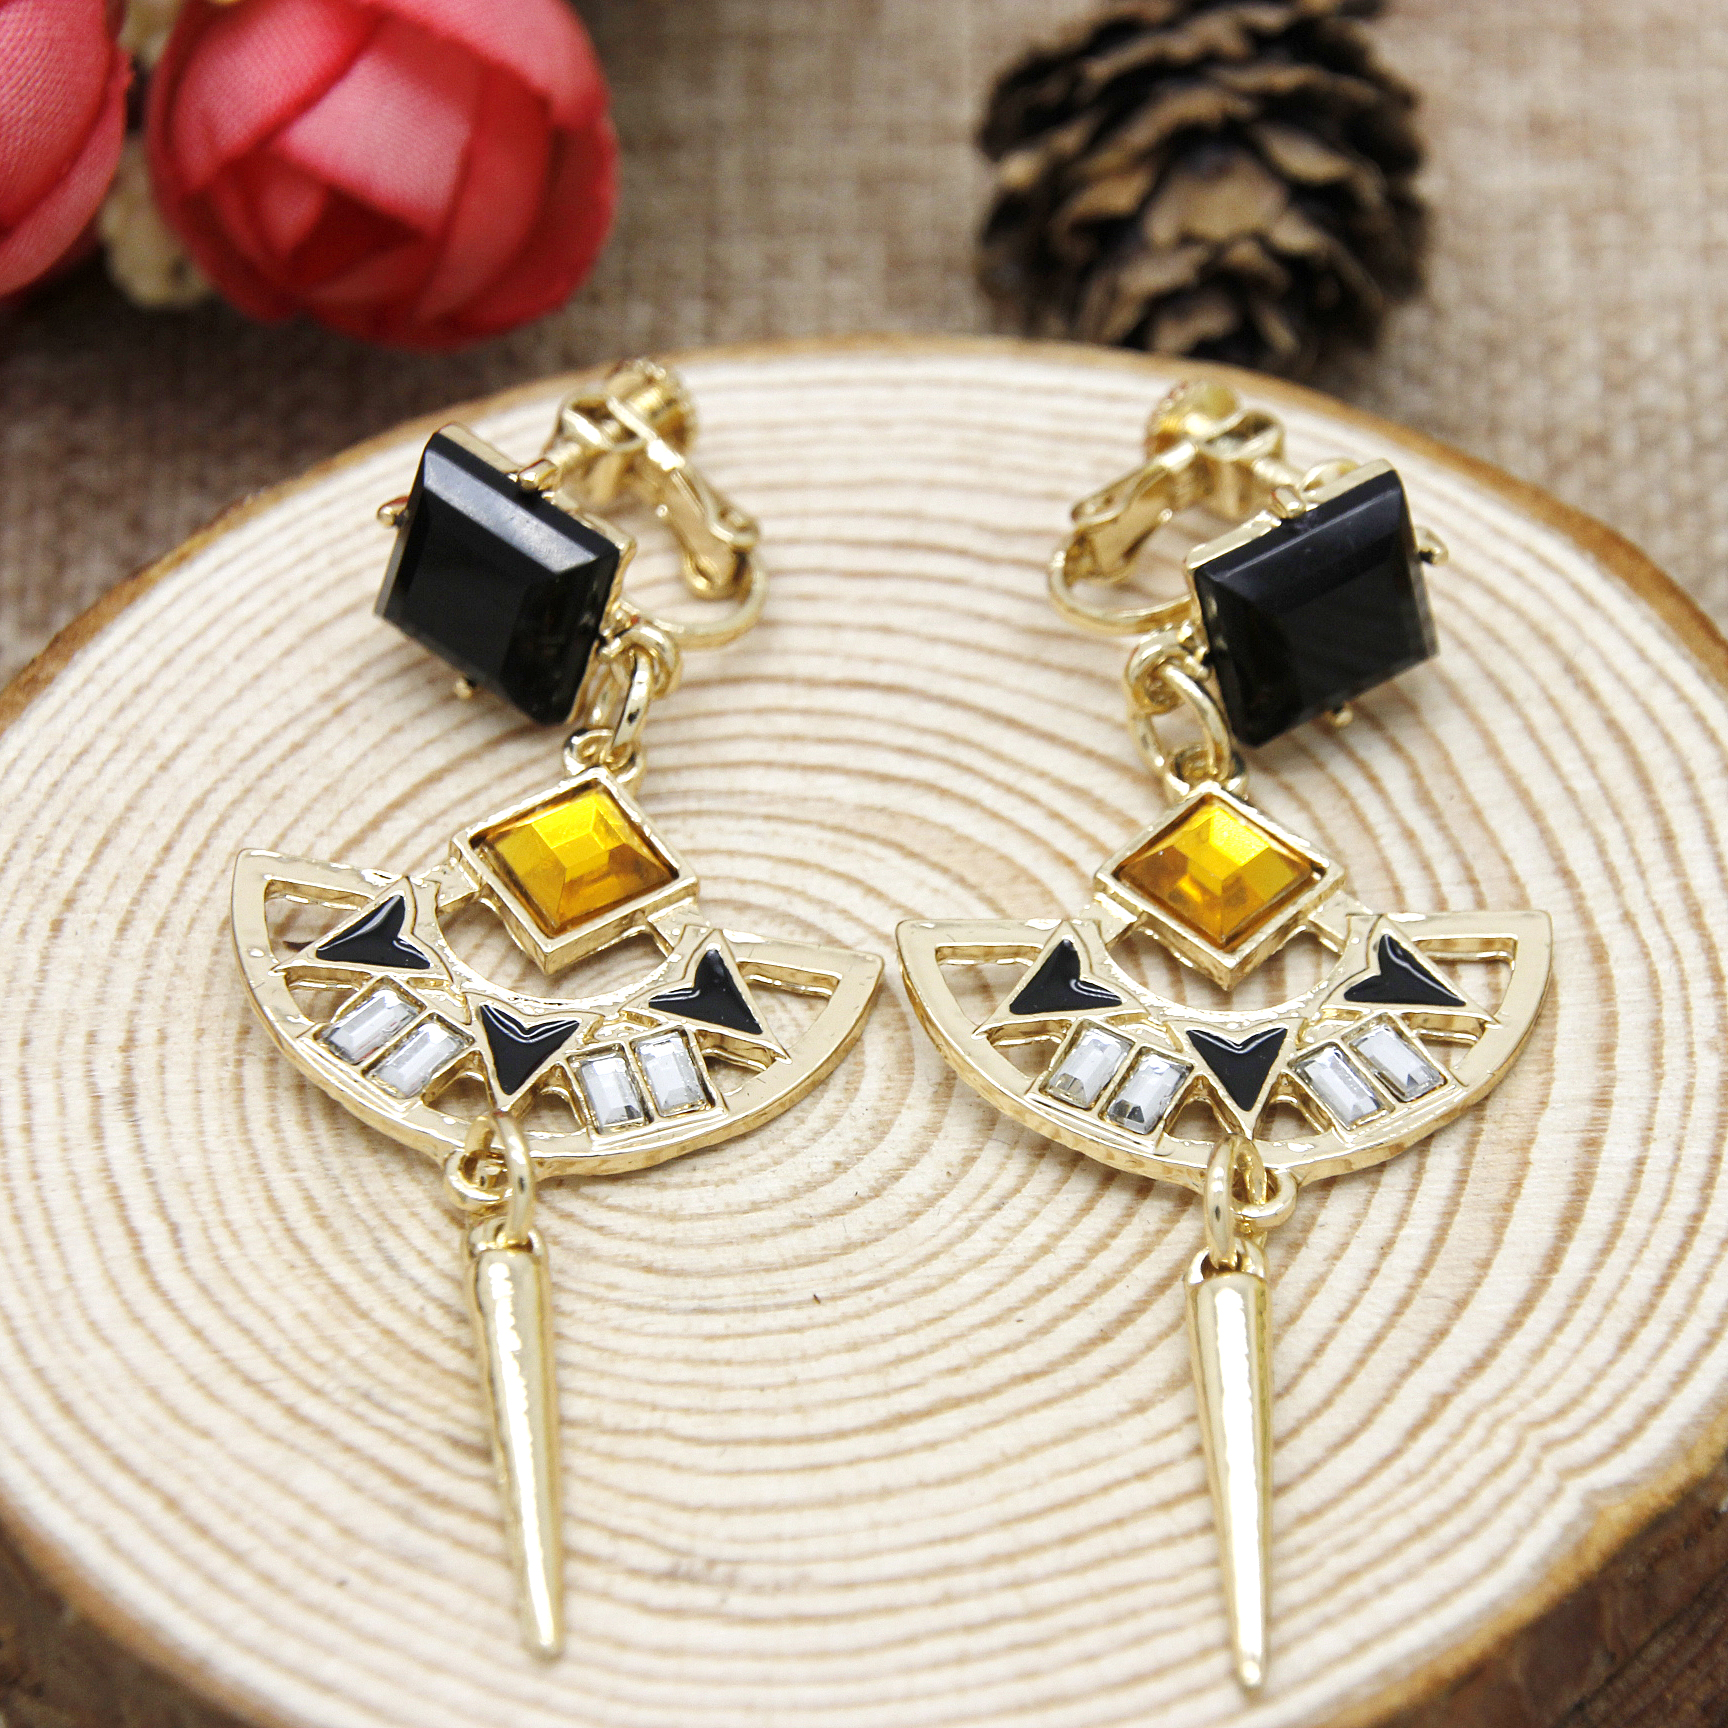 New listing 🎉2 pair Coach Earrings   Coach earrings, Coach jewelry, Pairs